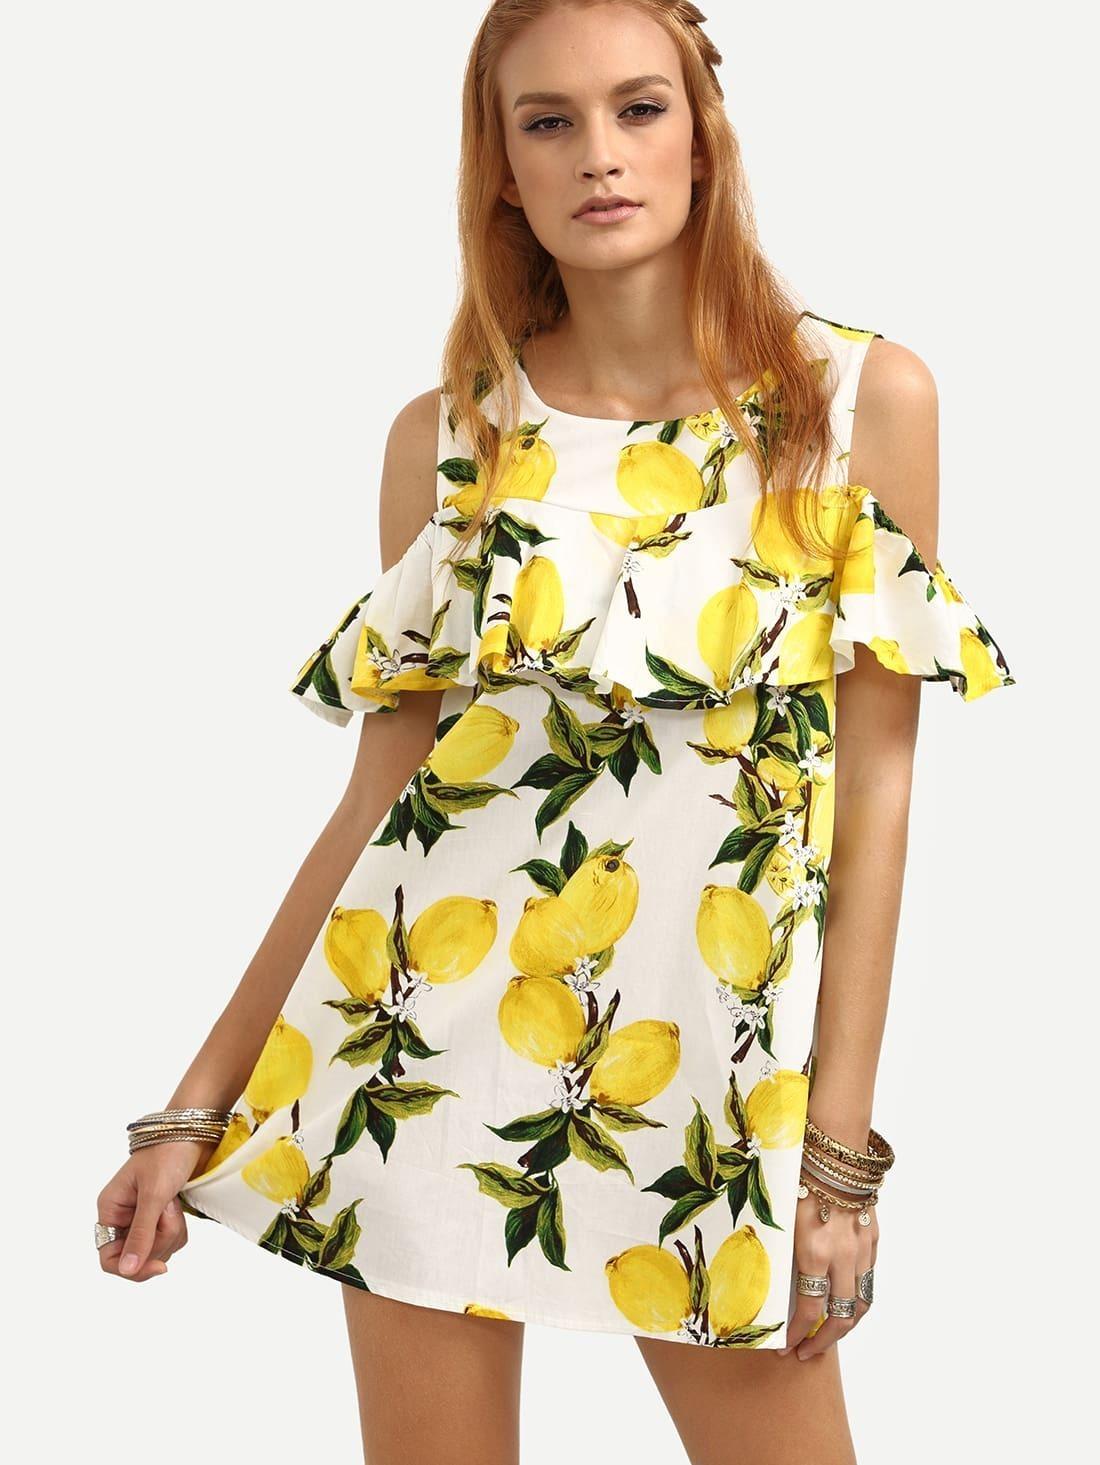 28d50793e83a Open Shoulder Ruffled Lemon Print Dress - Yellow EmmaCloth-Women Fast  Fashion Online